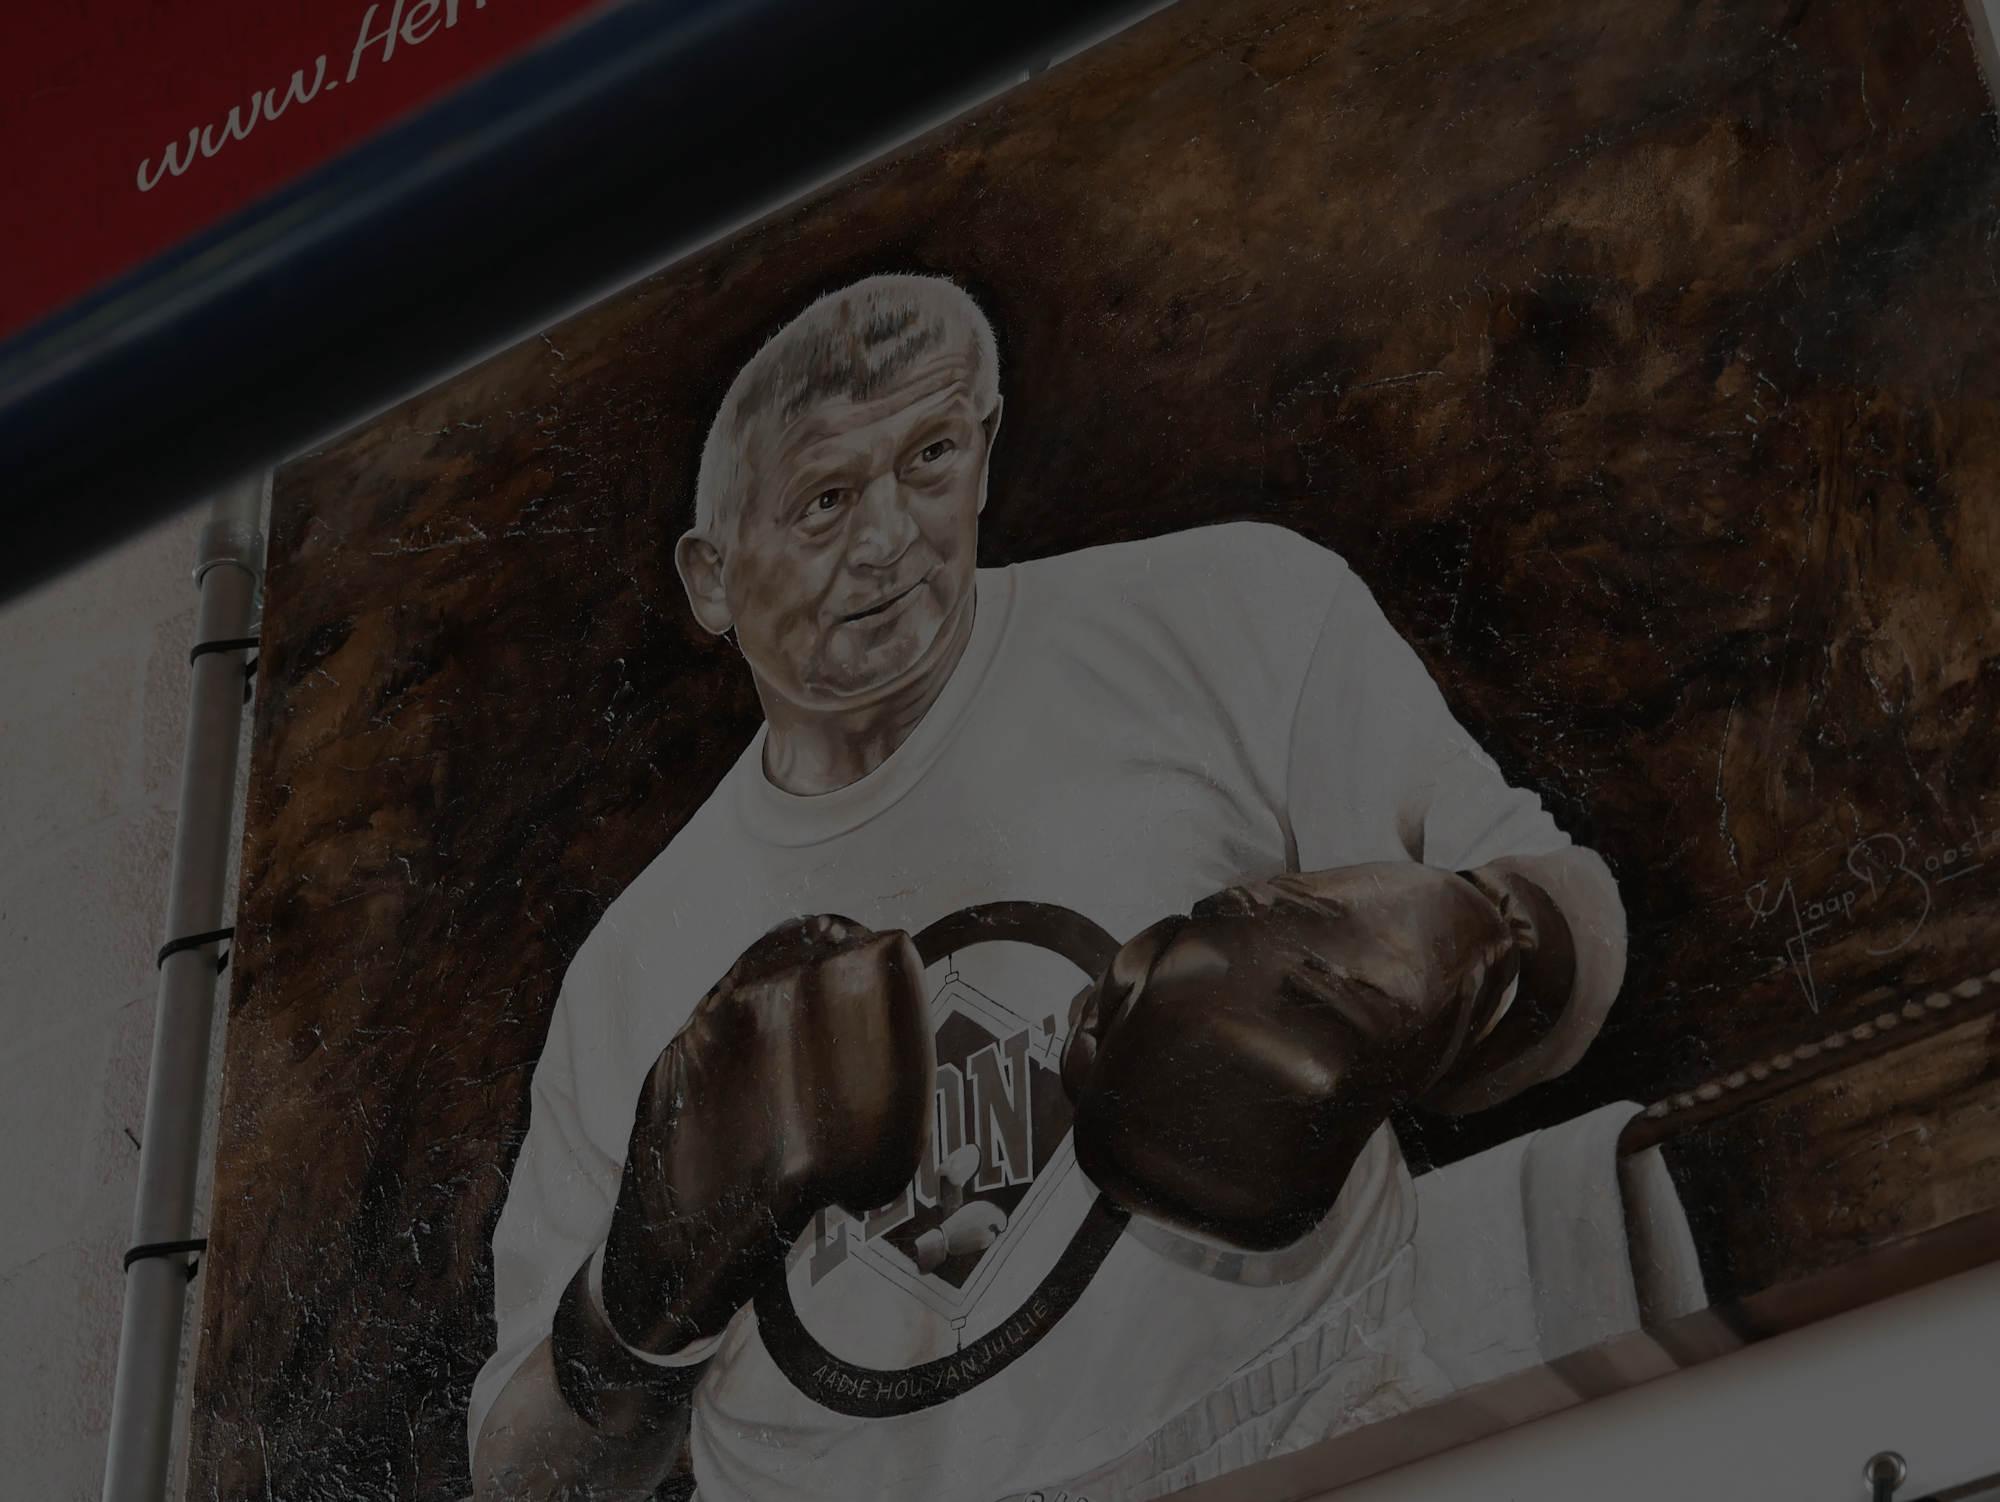 aad jansen boksen rotterdam leons boxing gym